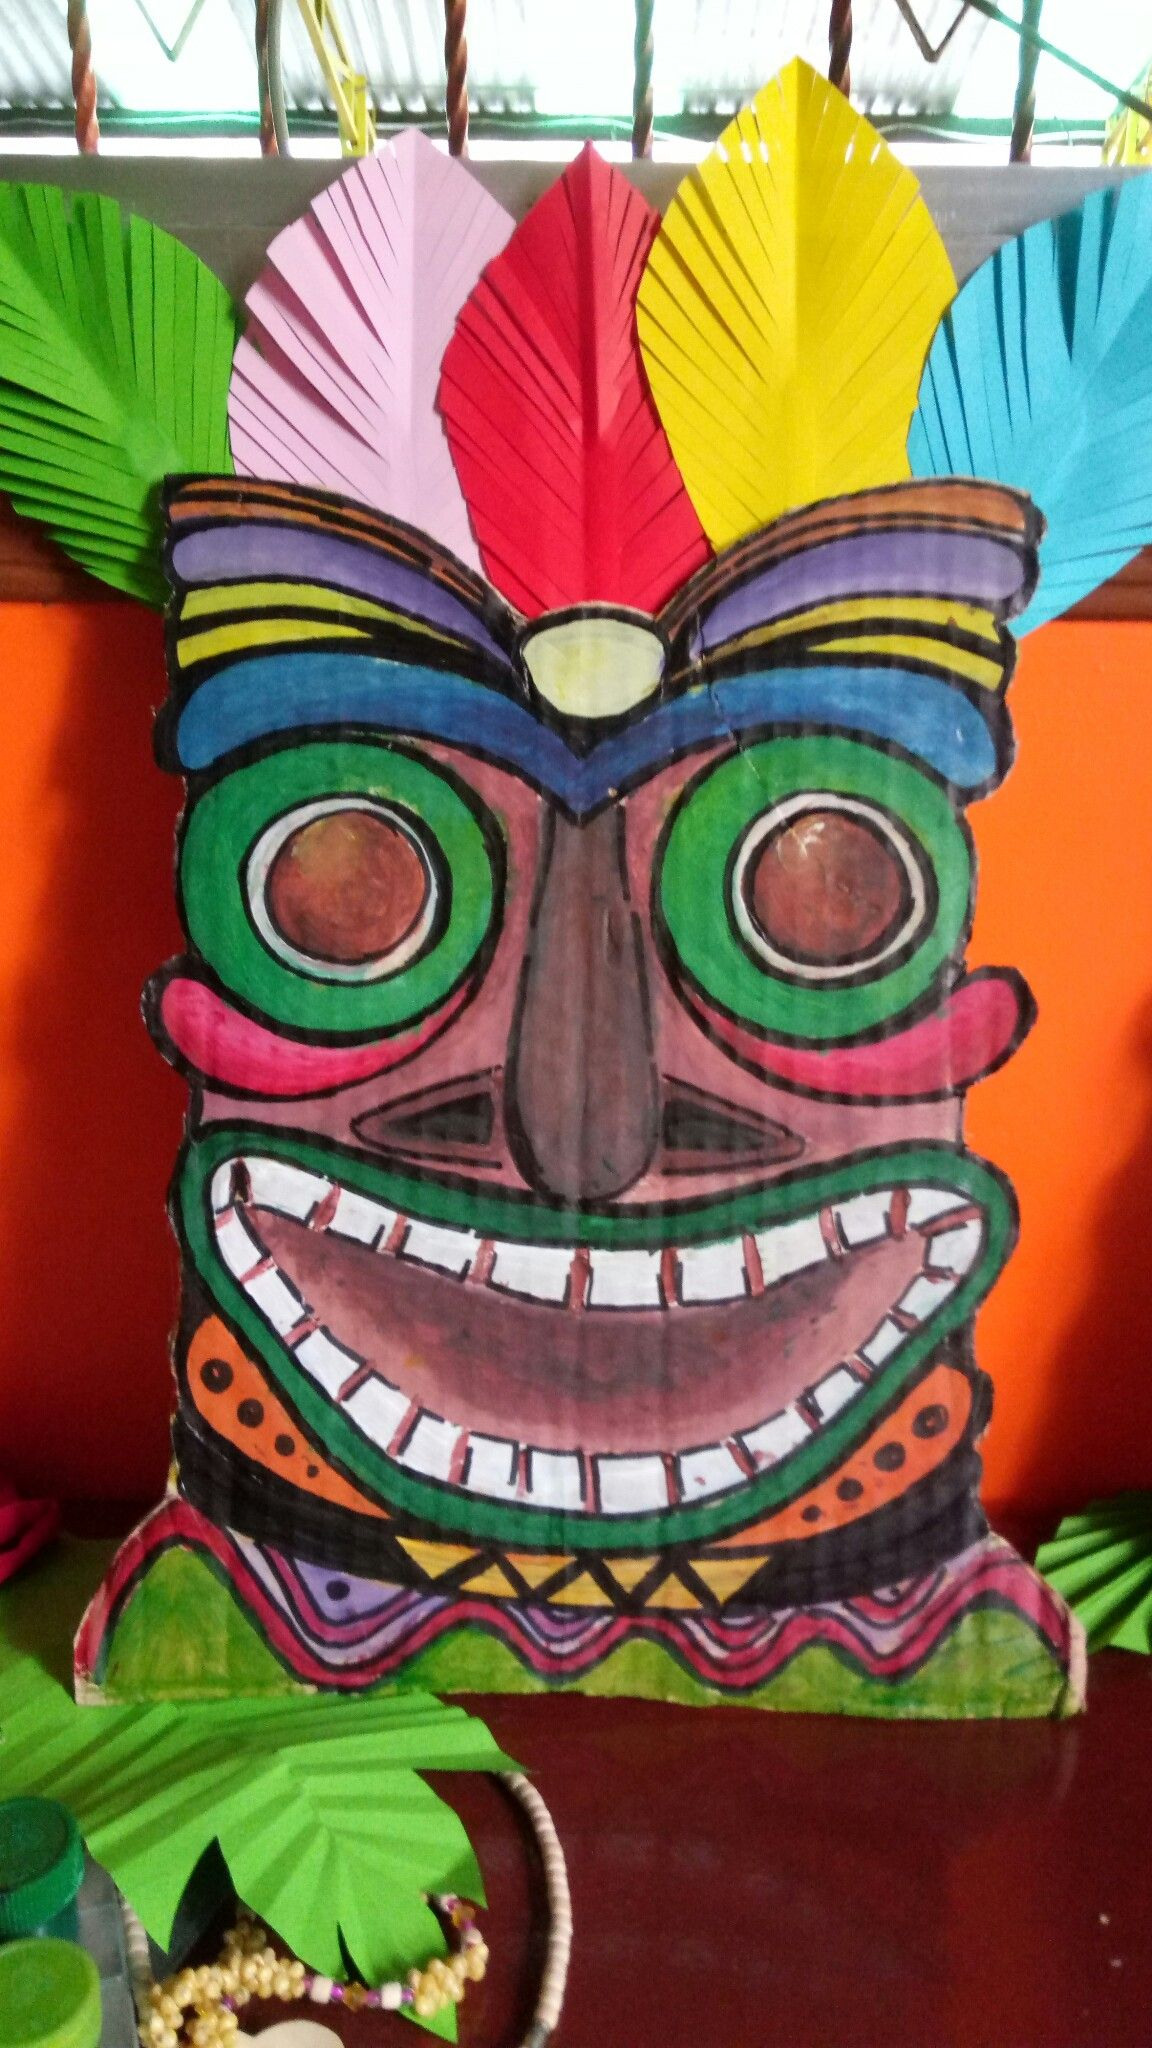 DIY Tiki Mask | door decoration | Pinterest | Luau party ...